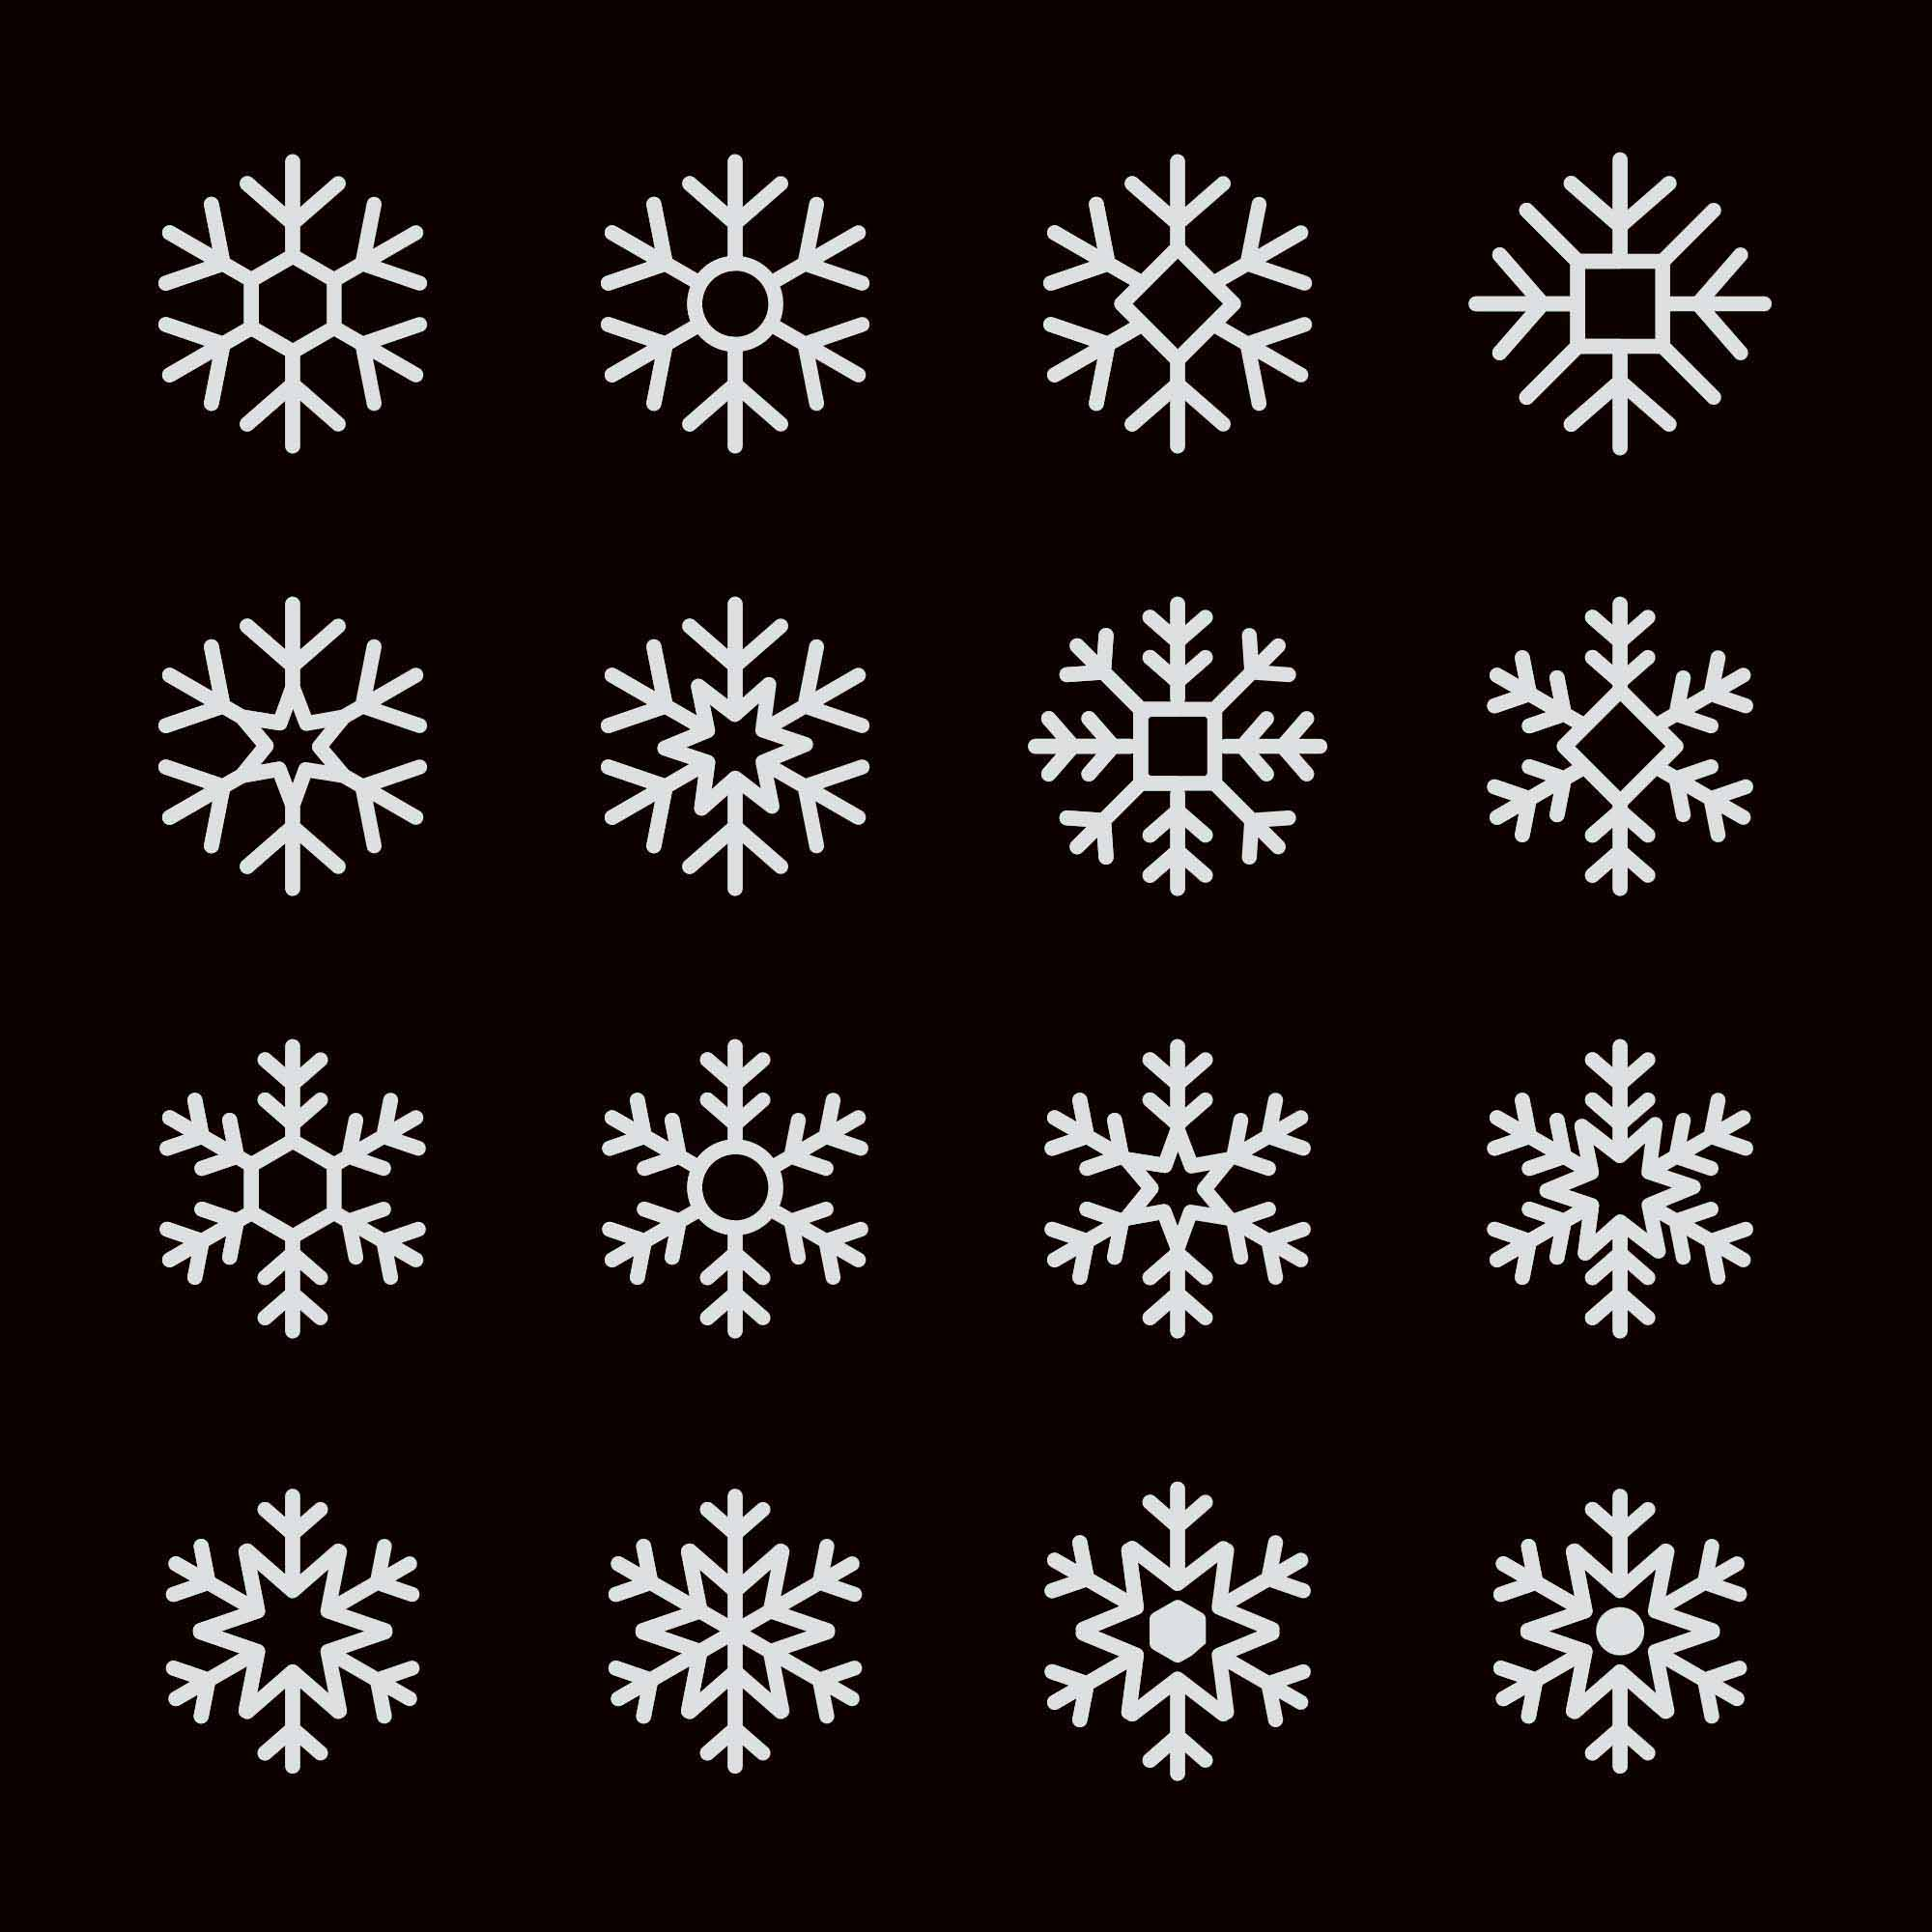 Snowflake Vector Icons 2